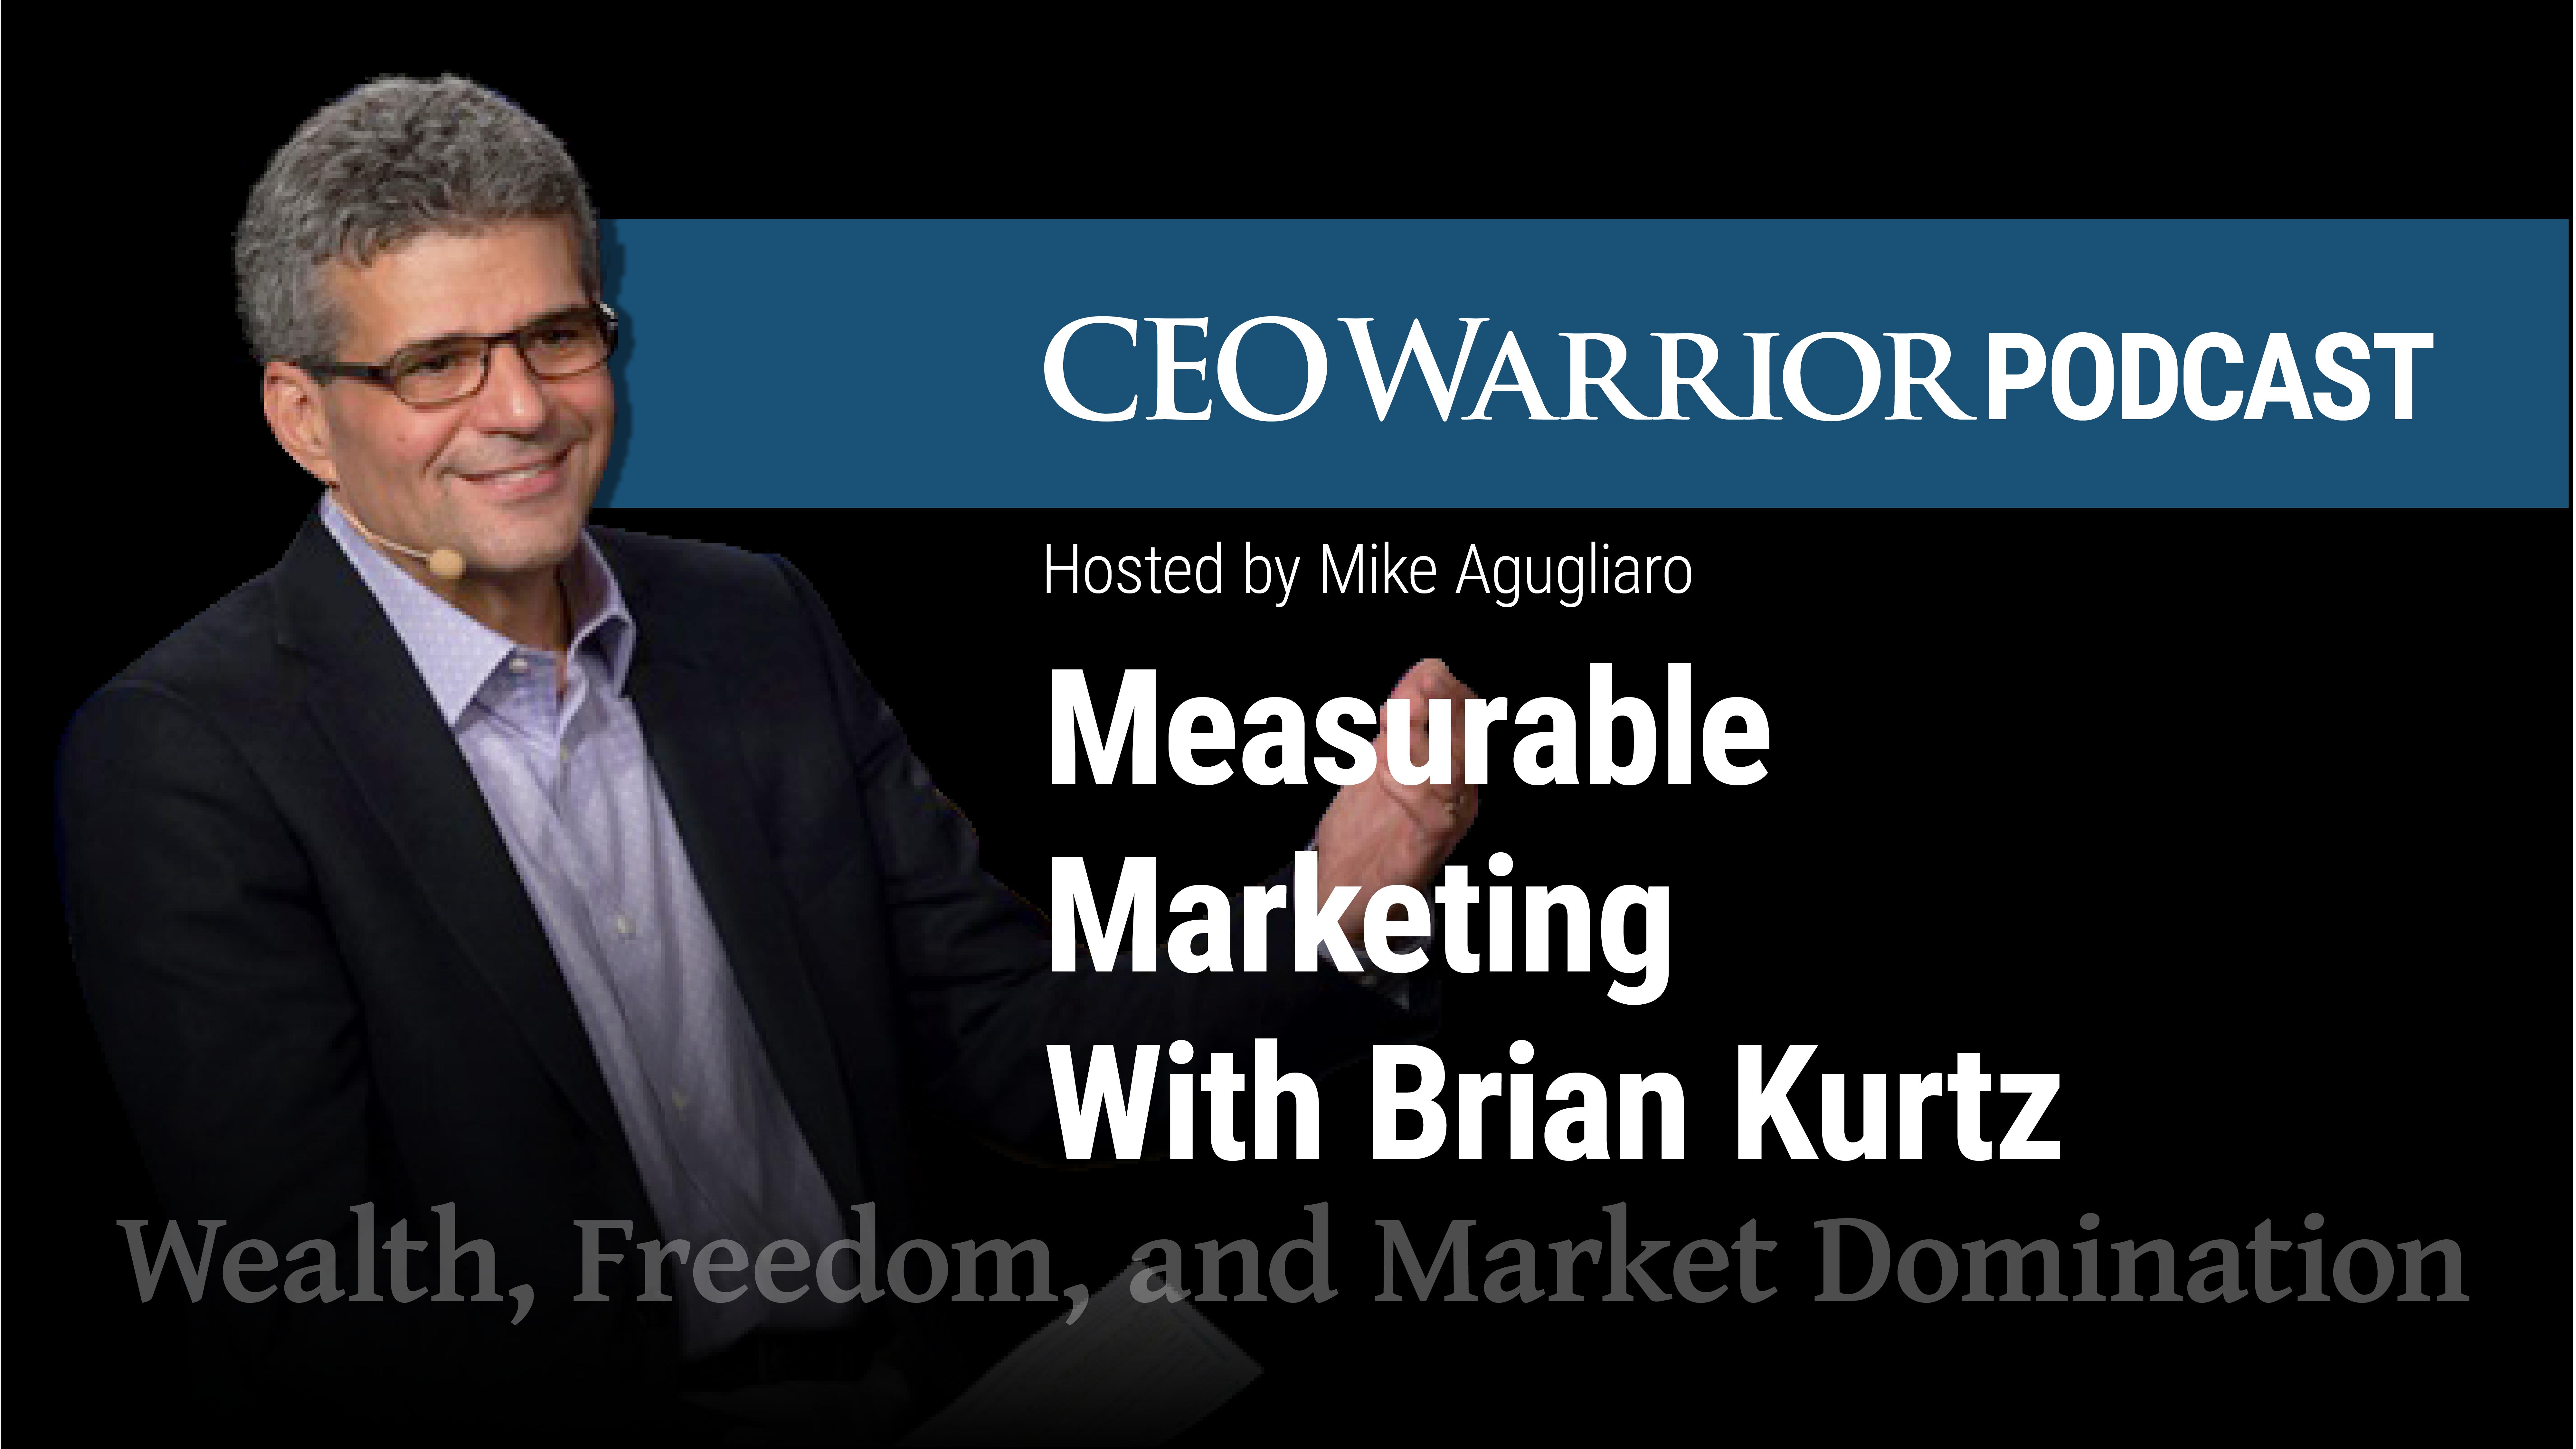 Measurable Marketing